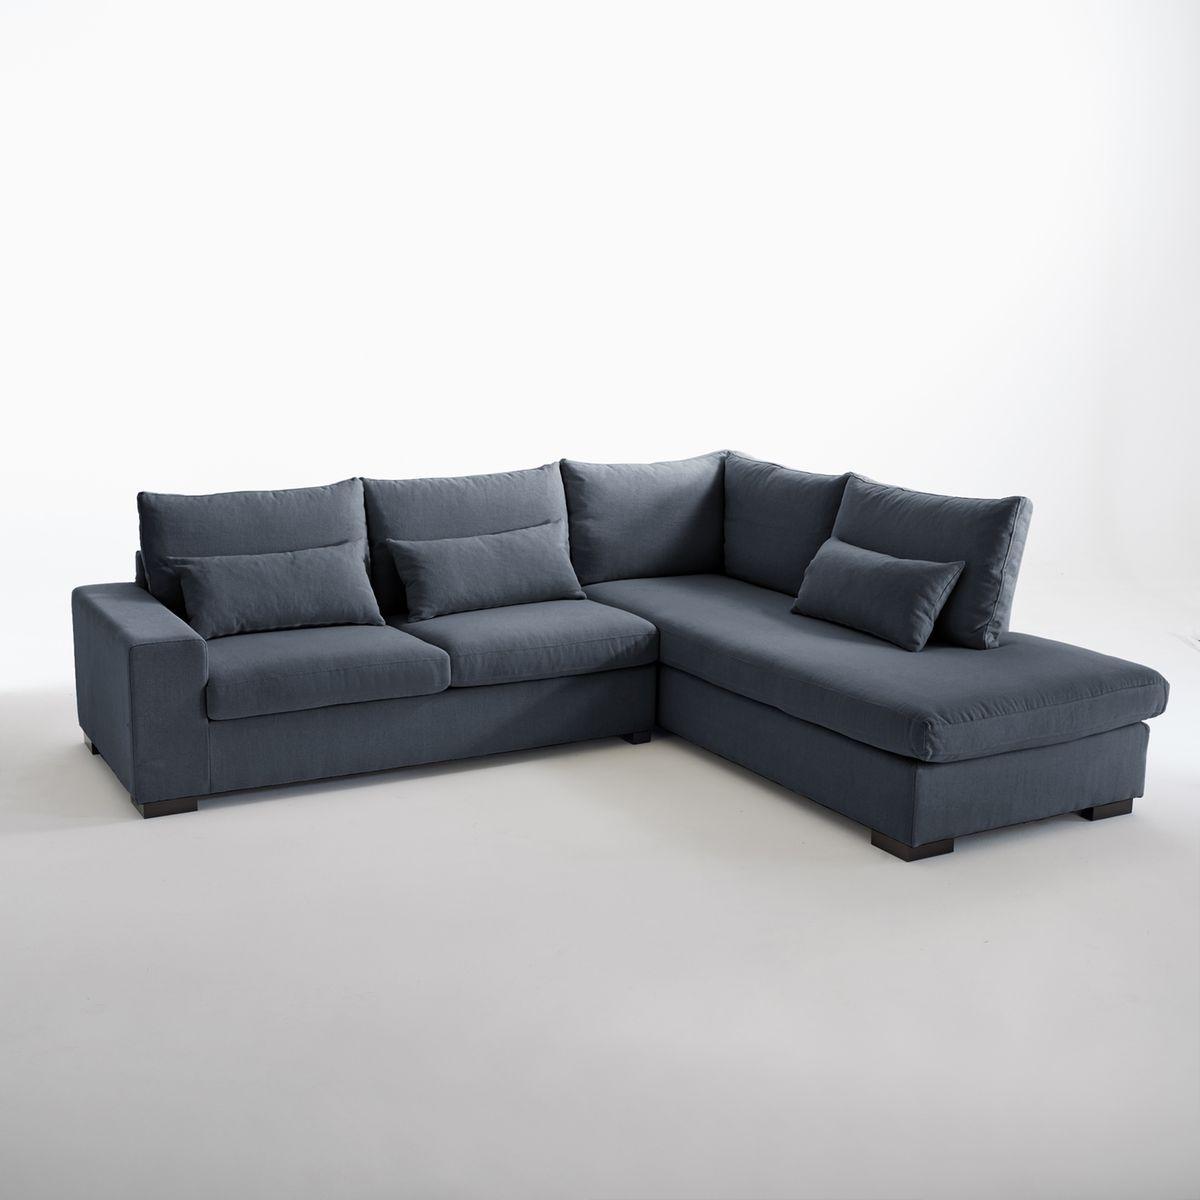 Canapé d'angle Odessa, Bultex, coton & lin,